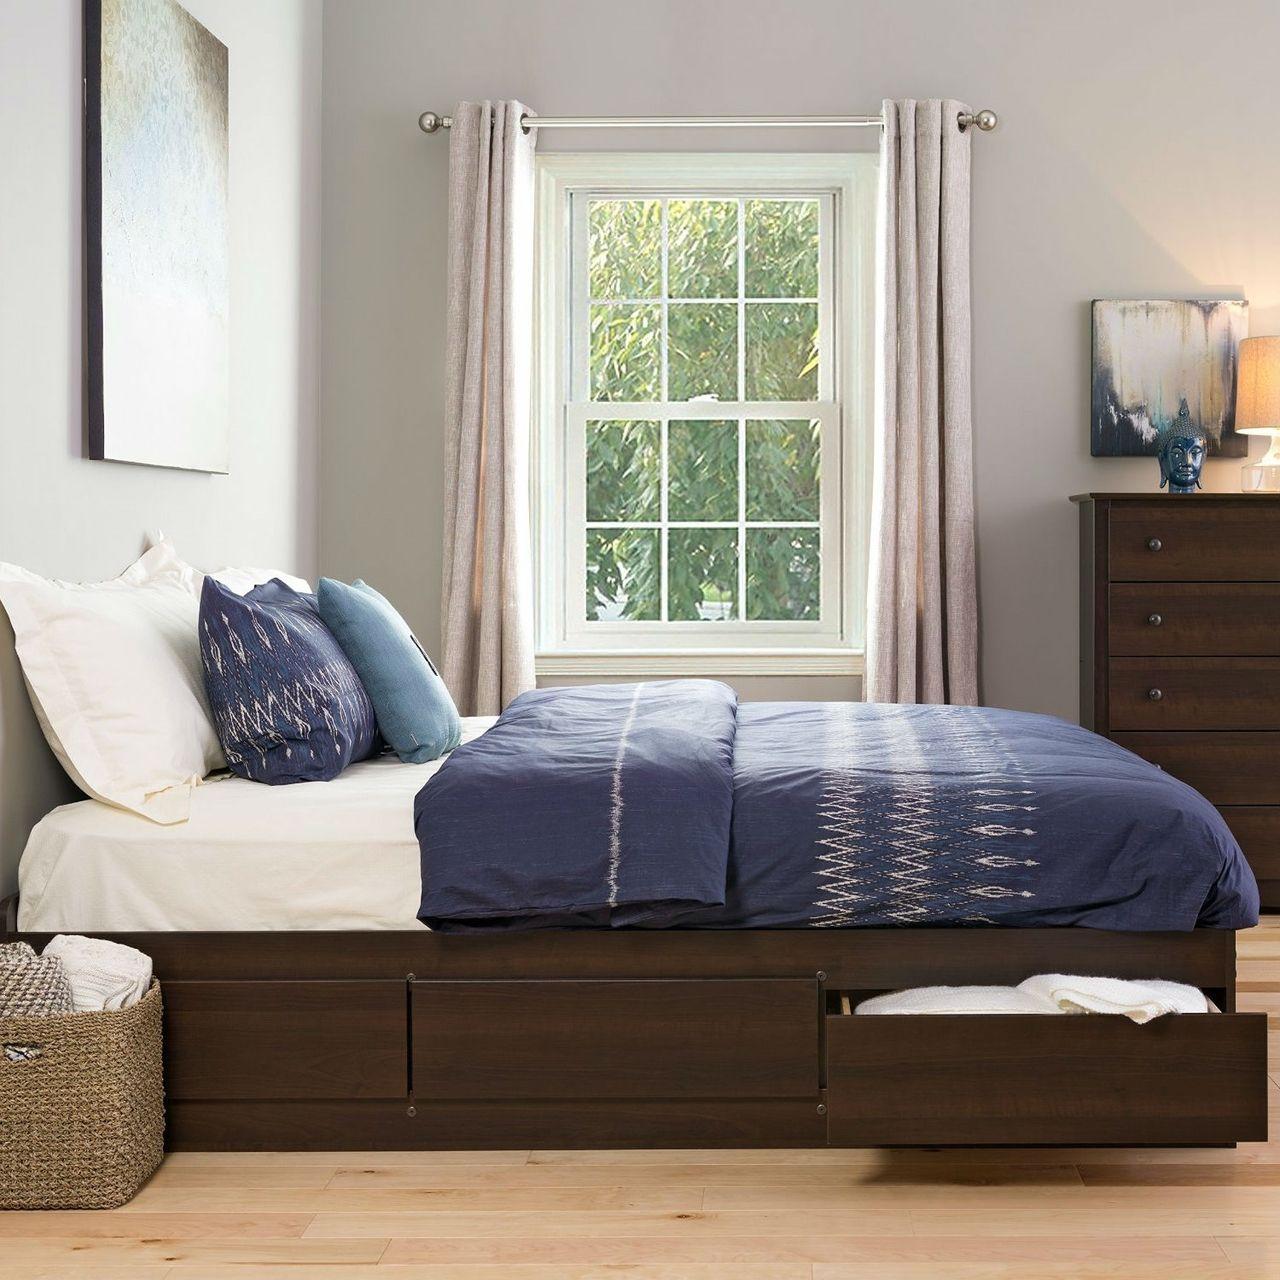 King Modern Espresso Platform Bed Frame with 6 Storage Drawers